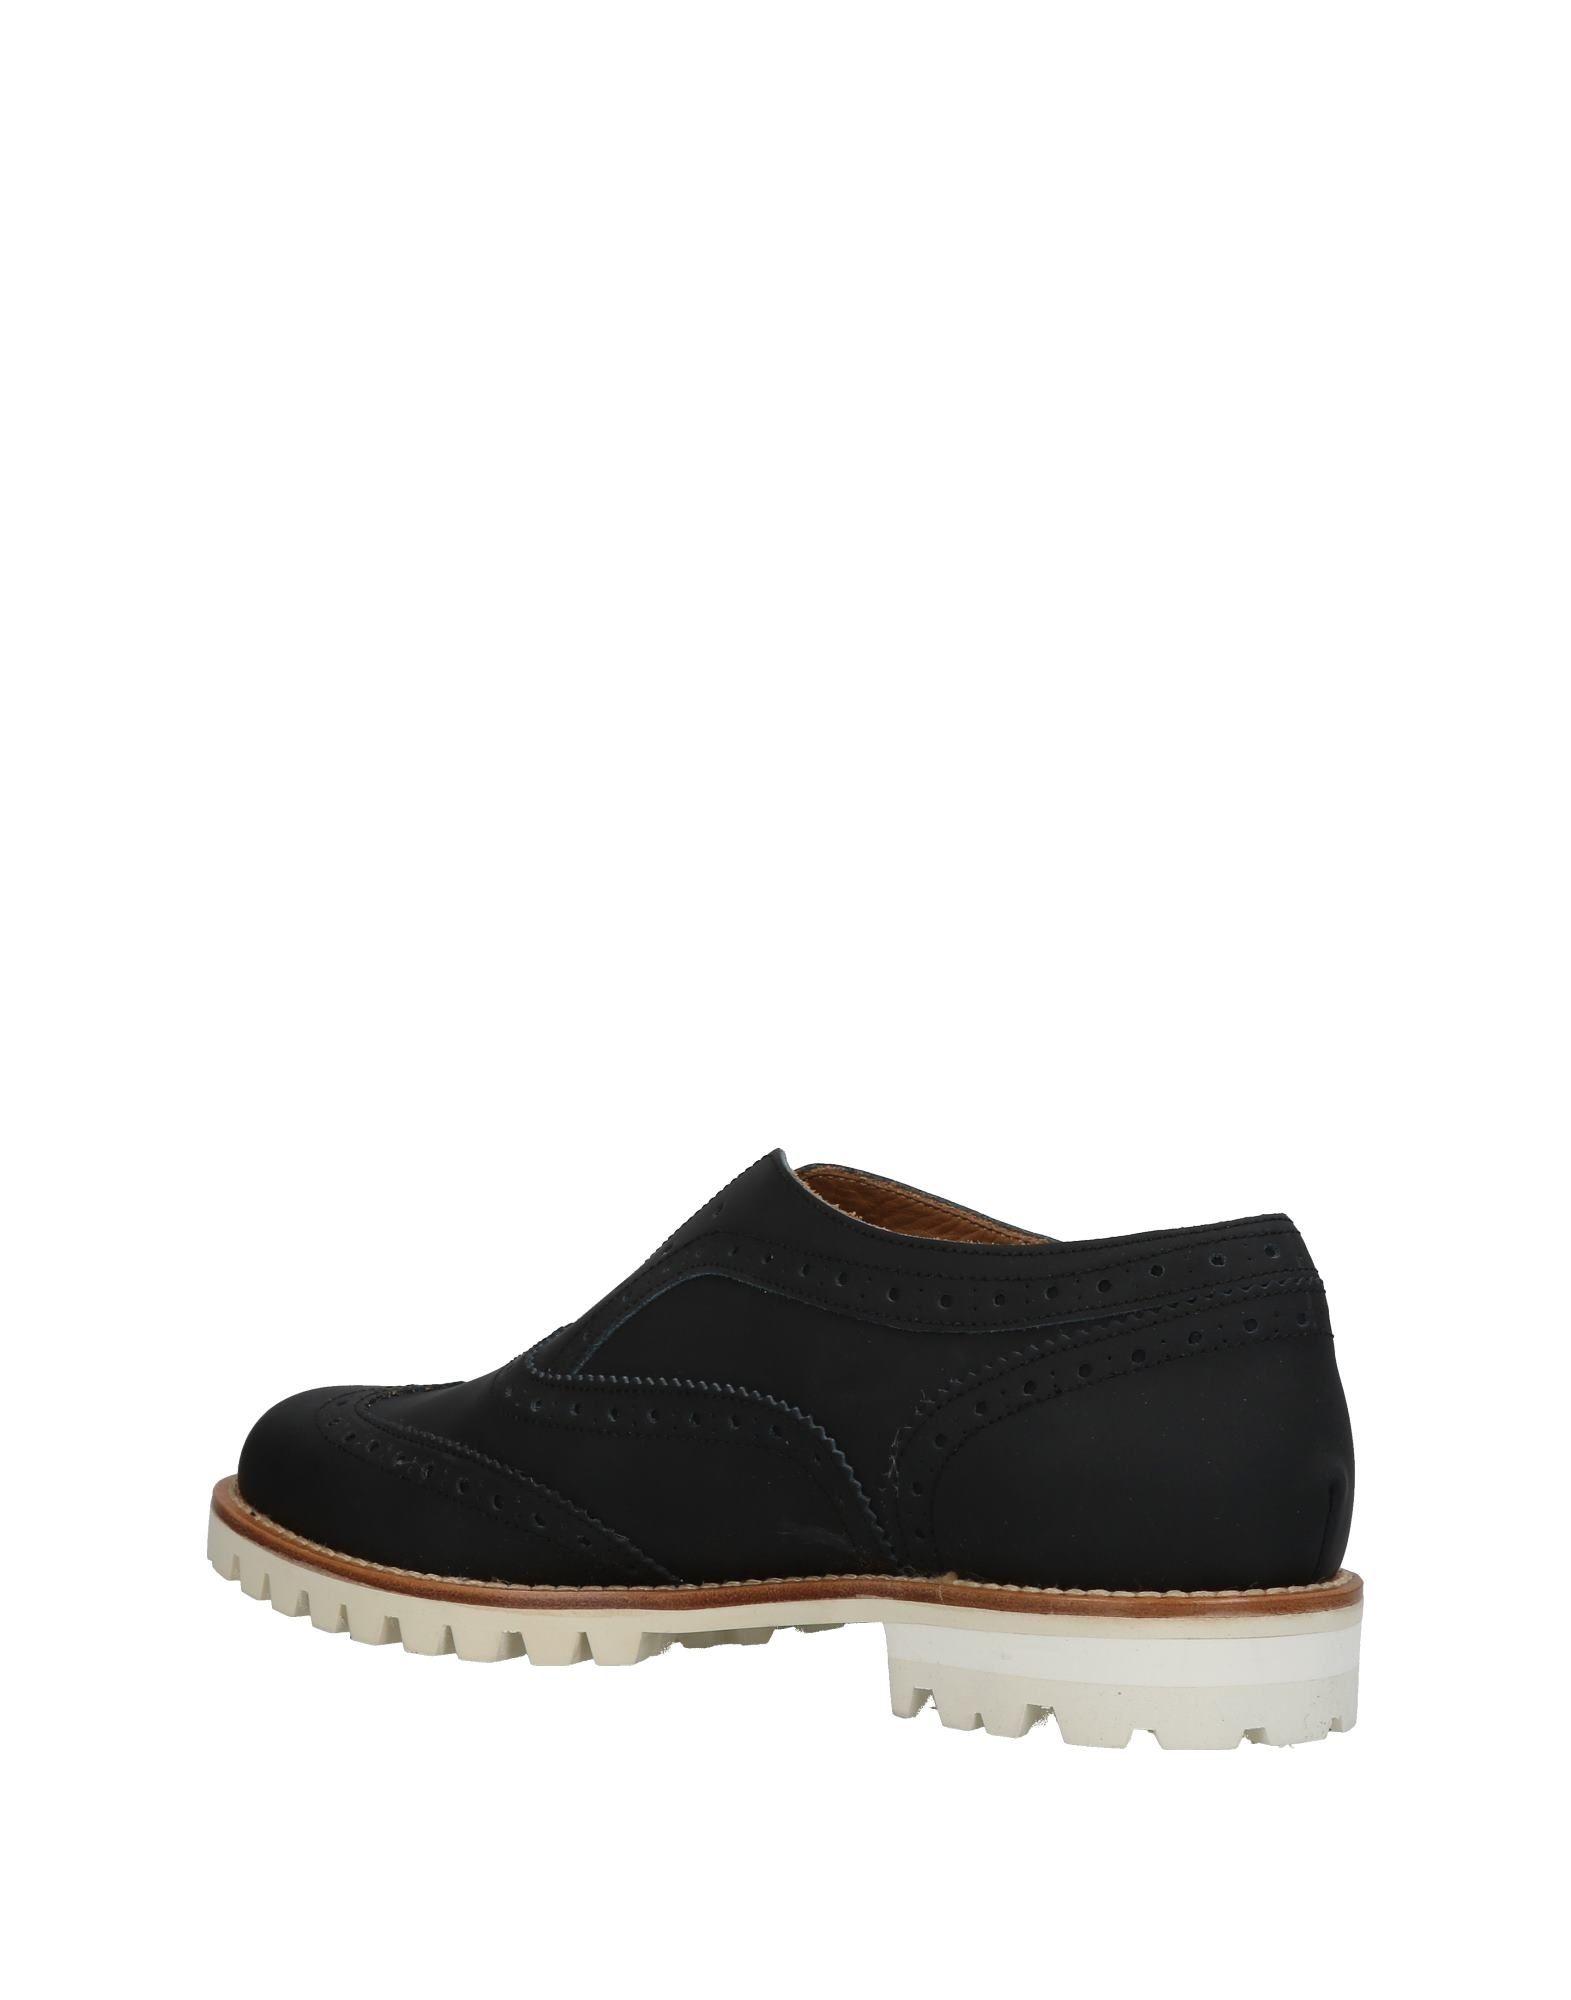 Rabatt Mokassins echte Schuhe L'f Shoes Mokassins Rabatt Herren  11448955JA 3f6c6e